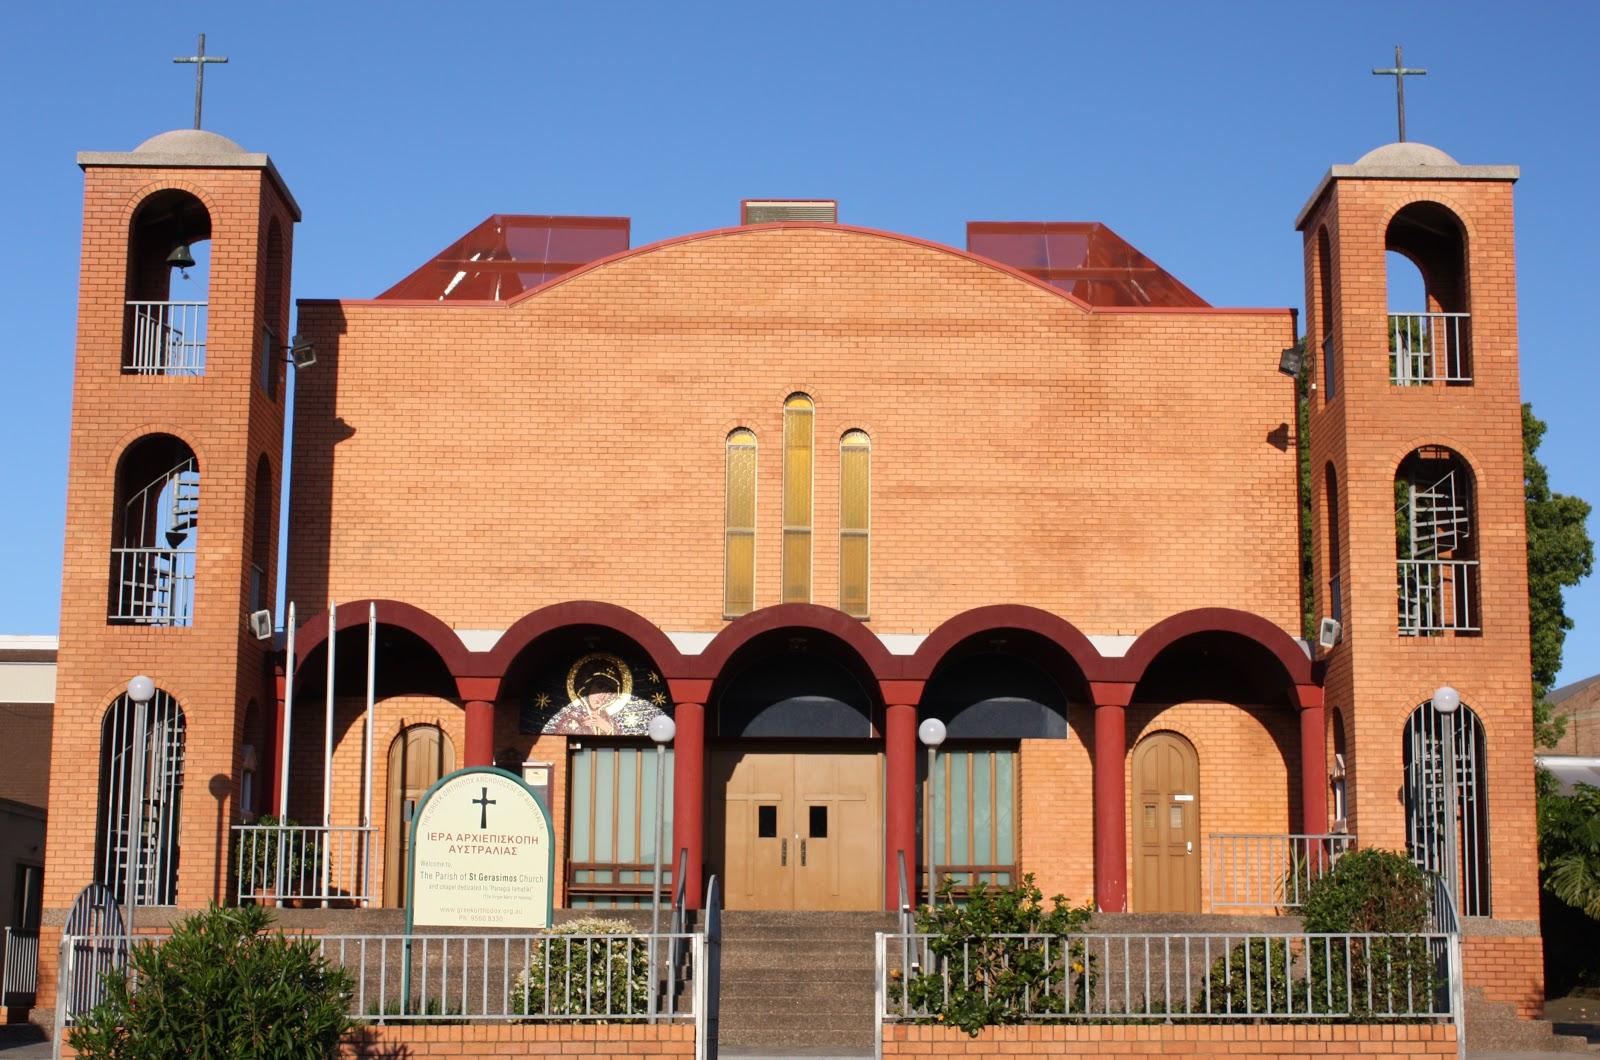 Sydney - City and Suburbs: Leichhardt, St Gerasimos Greek Orthodox